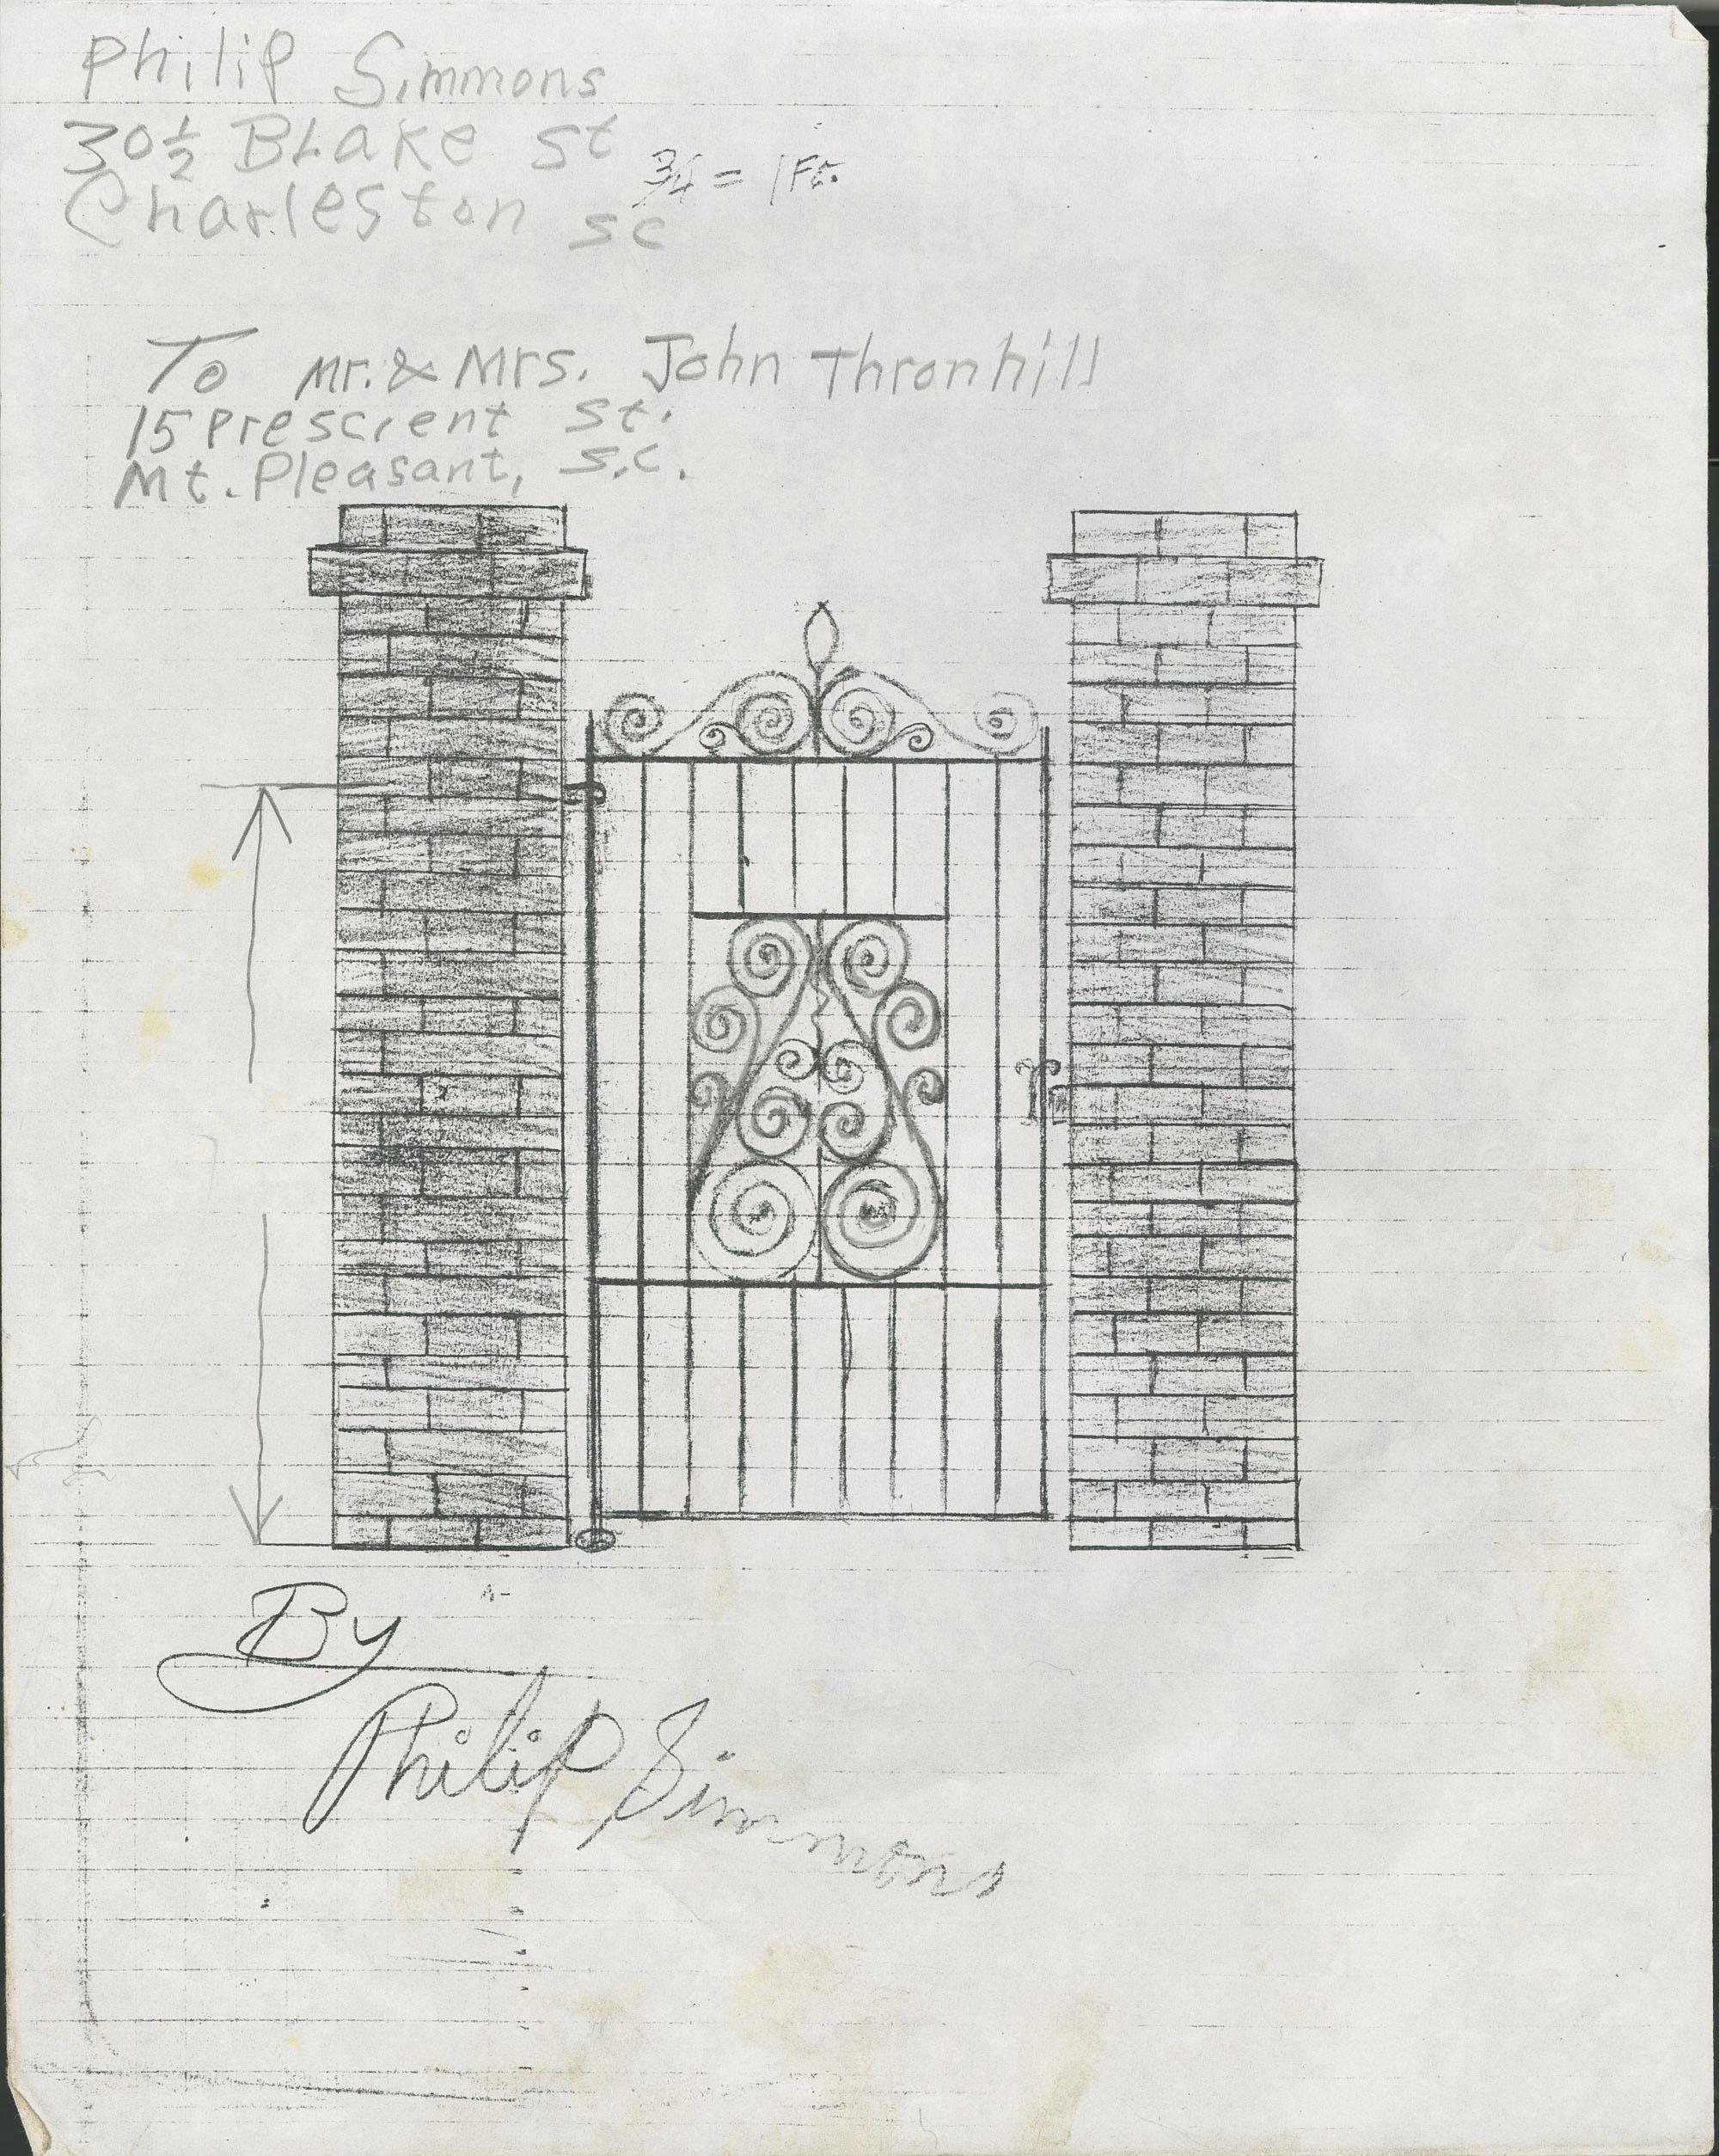 15 Prescient Street gate